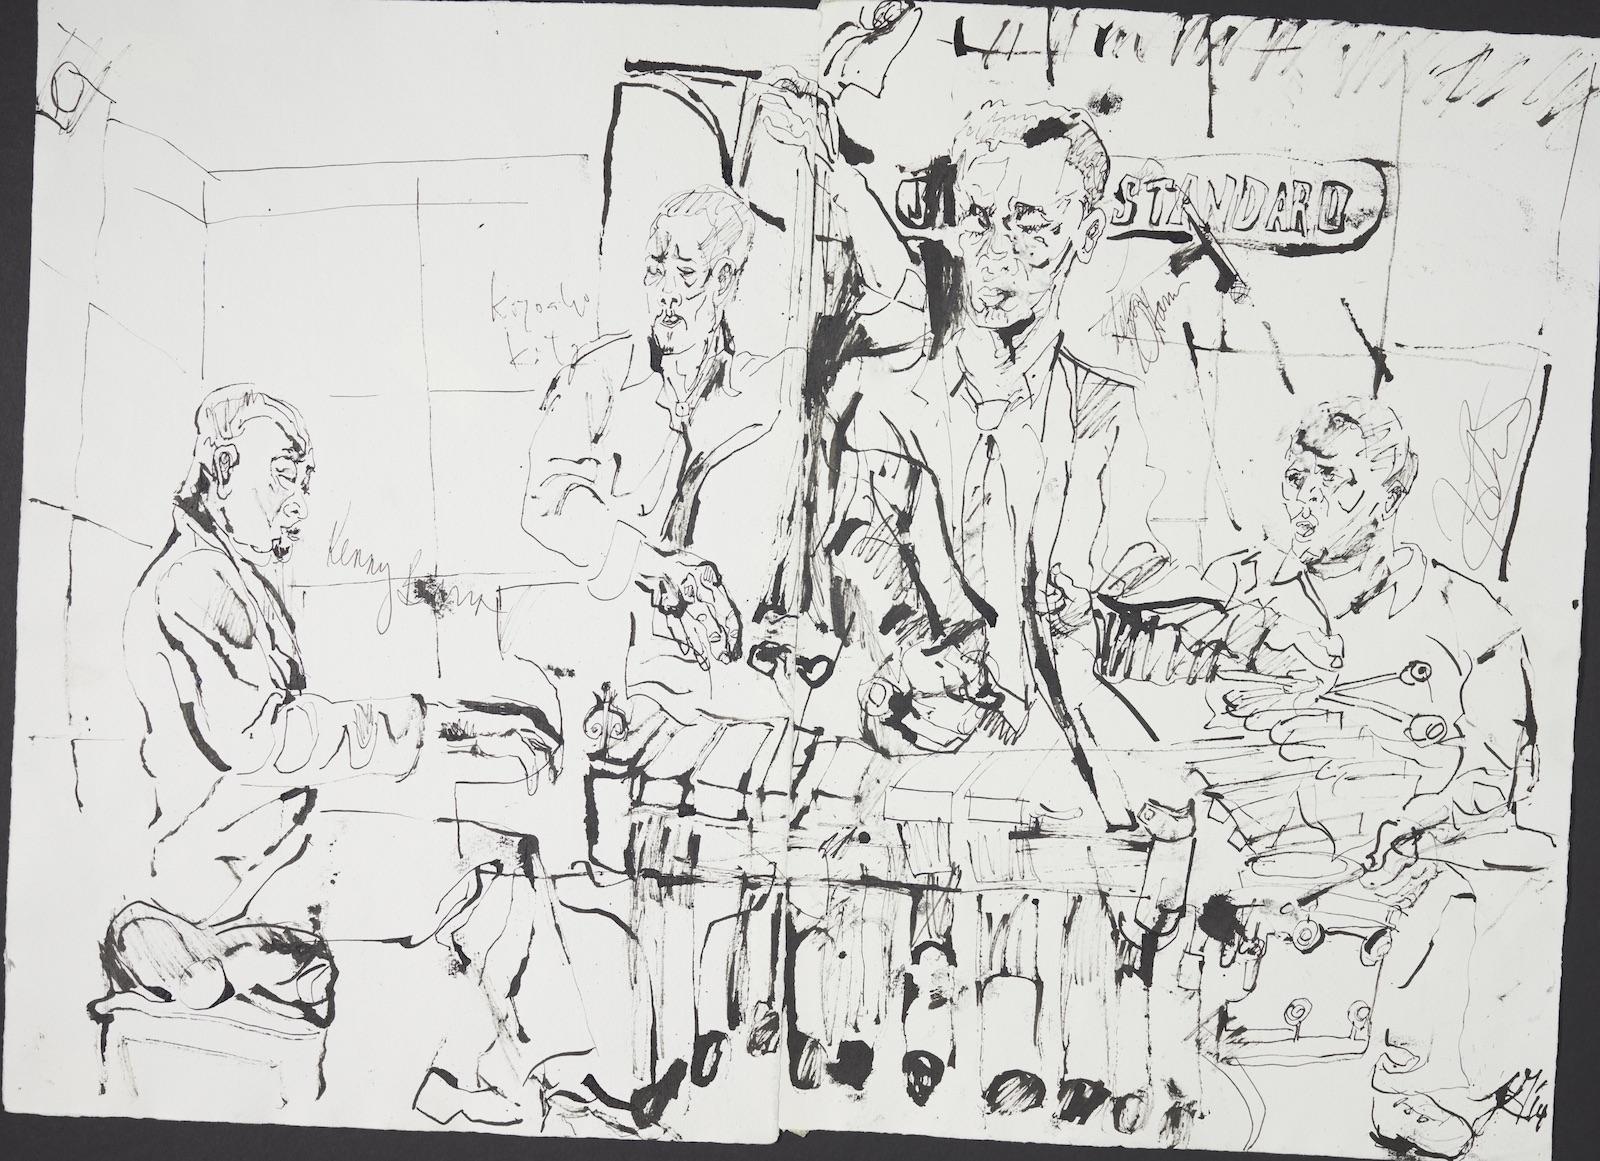 Kenny barron quartet at jazz standard 2014